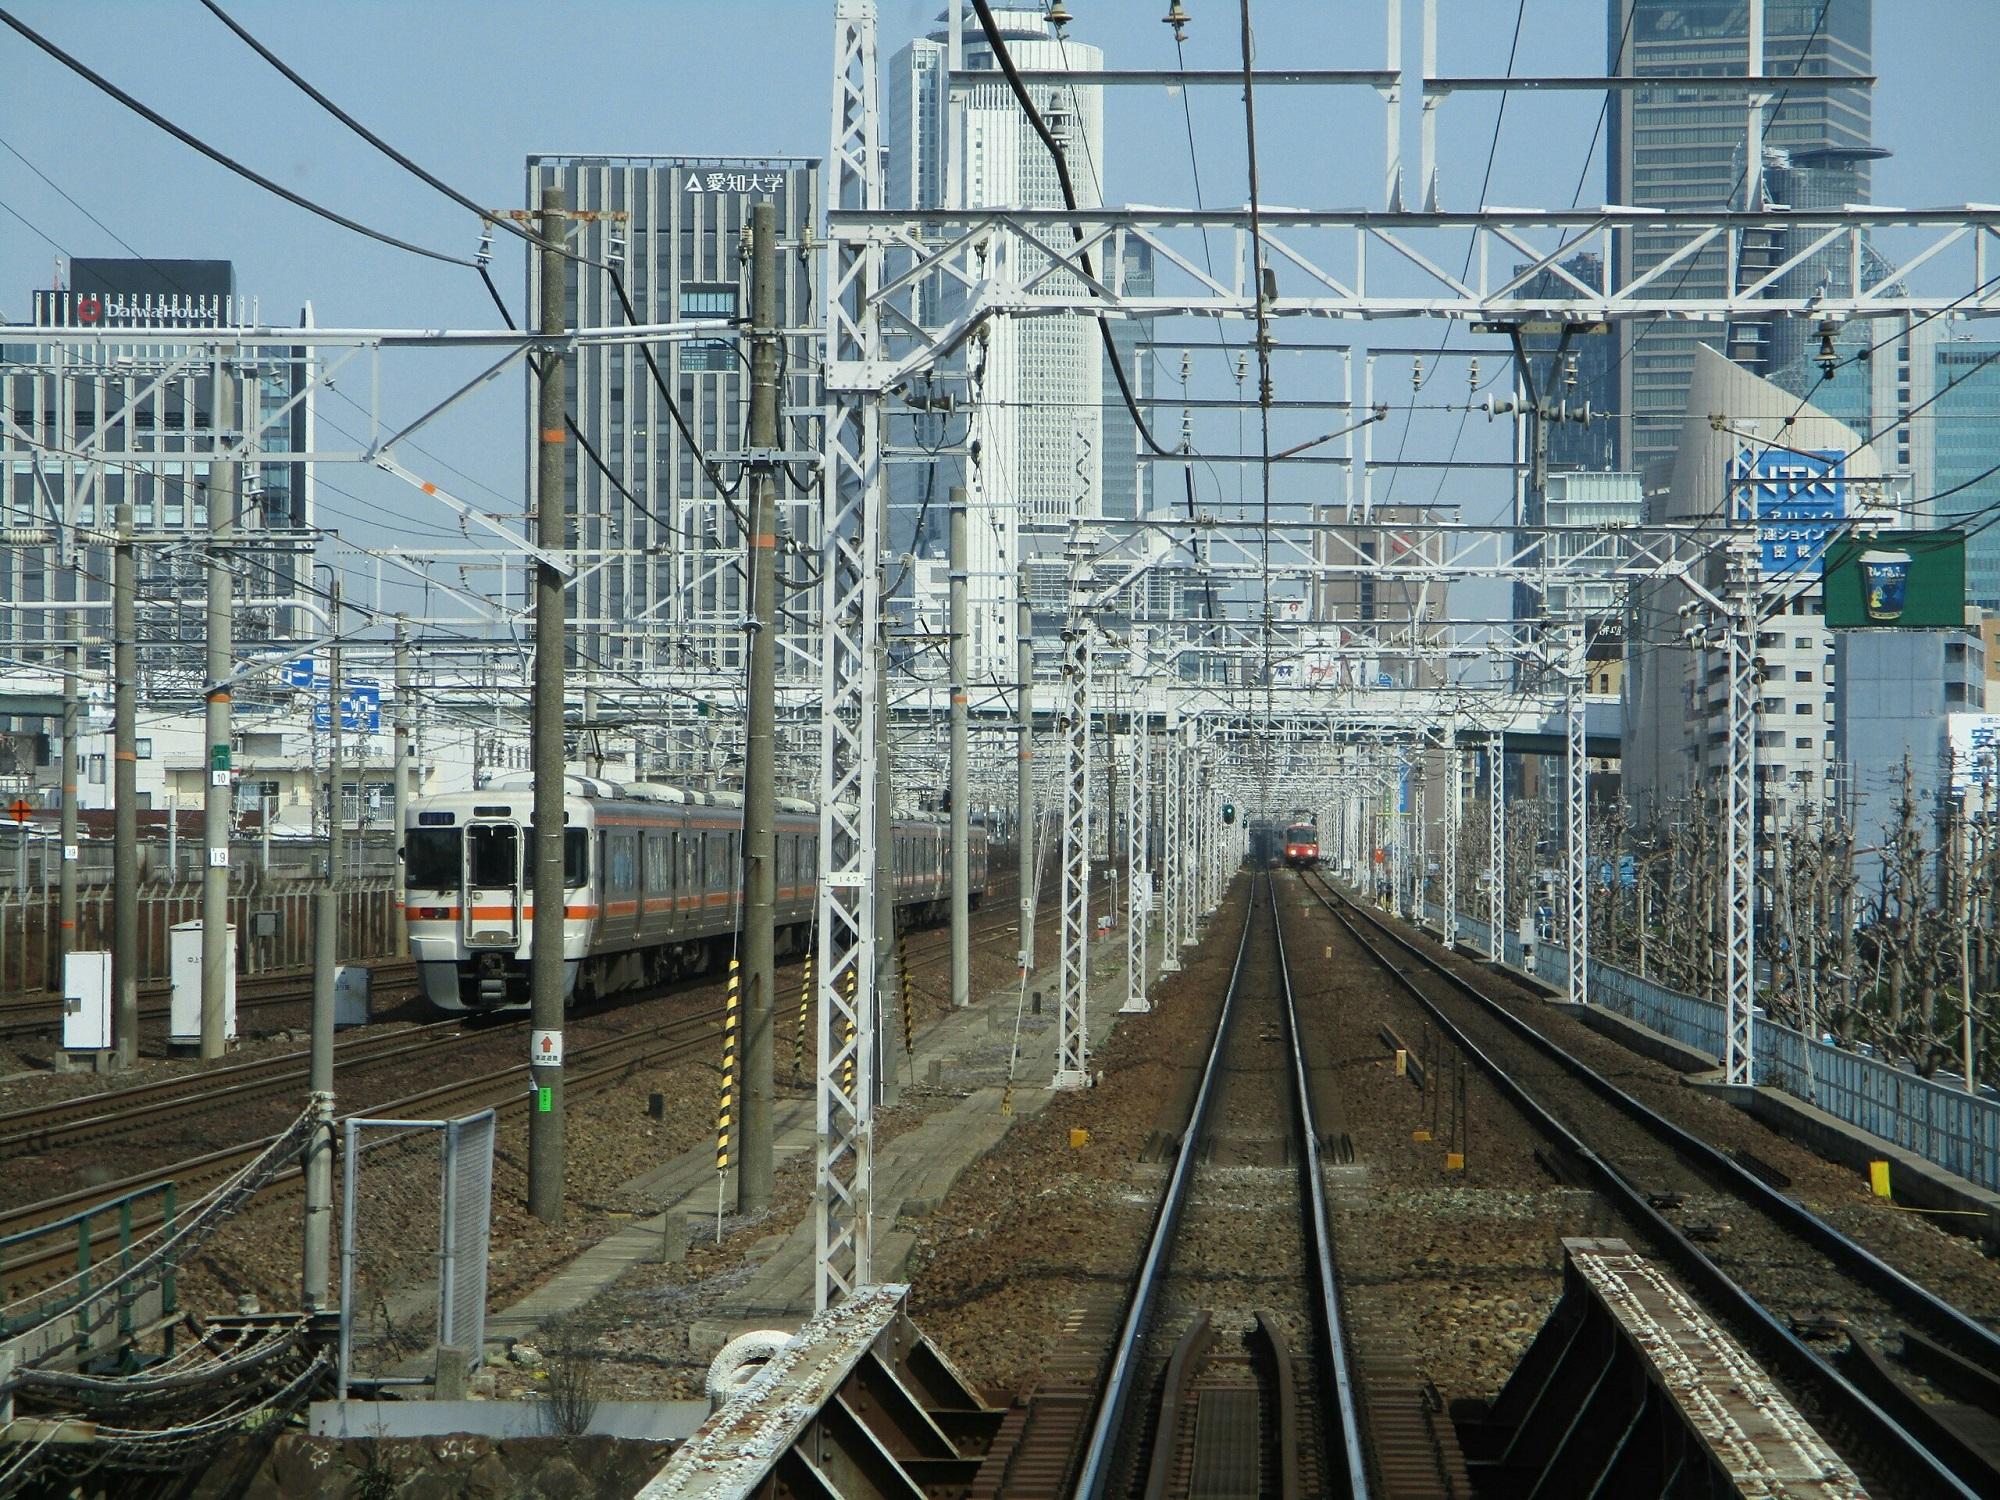 2019.3.27 (51) 弥富いき準急 - 山王名古屋間(東海道線電車) 2000-1500